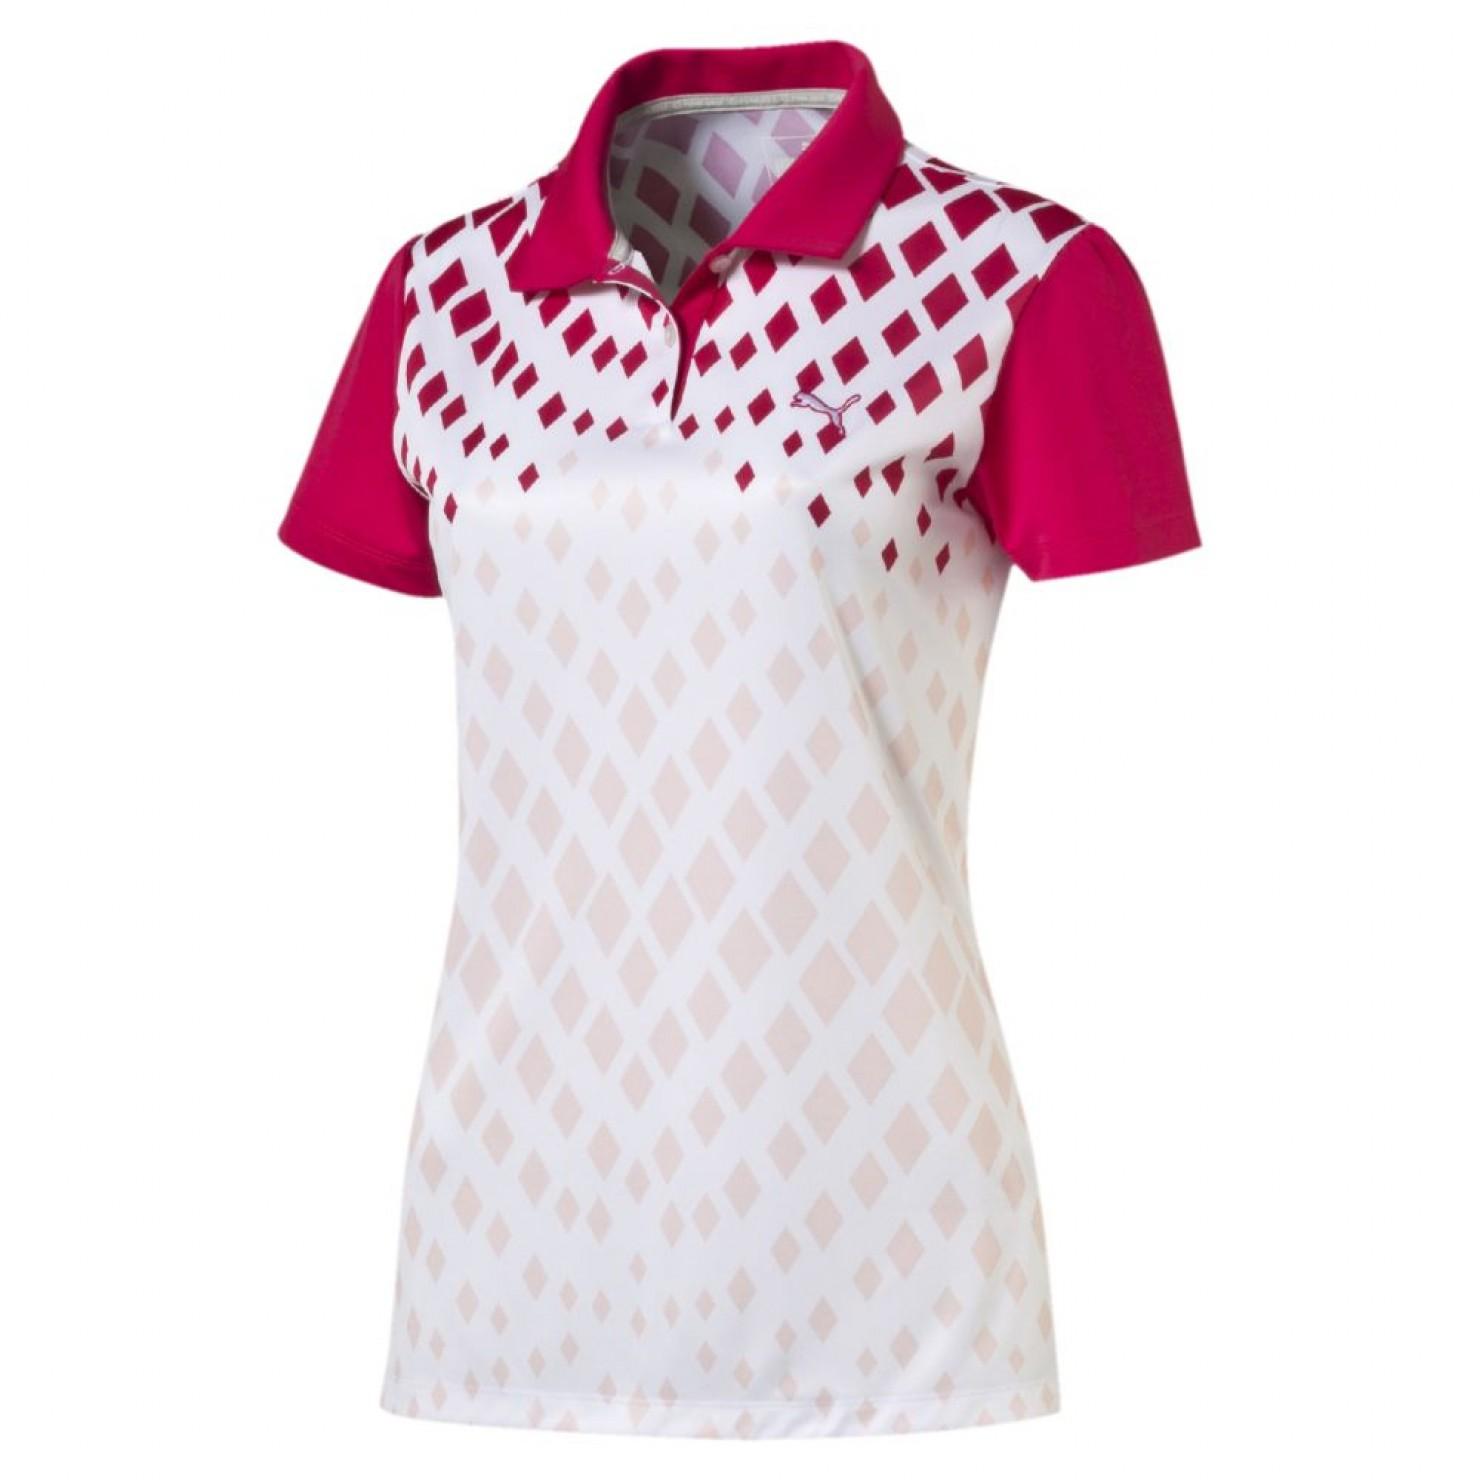 Puma golf Puma juniorské golfové tričko Diamond Print Velikost: 164